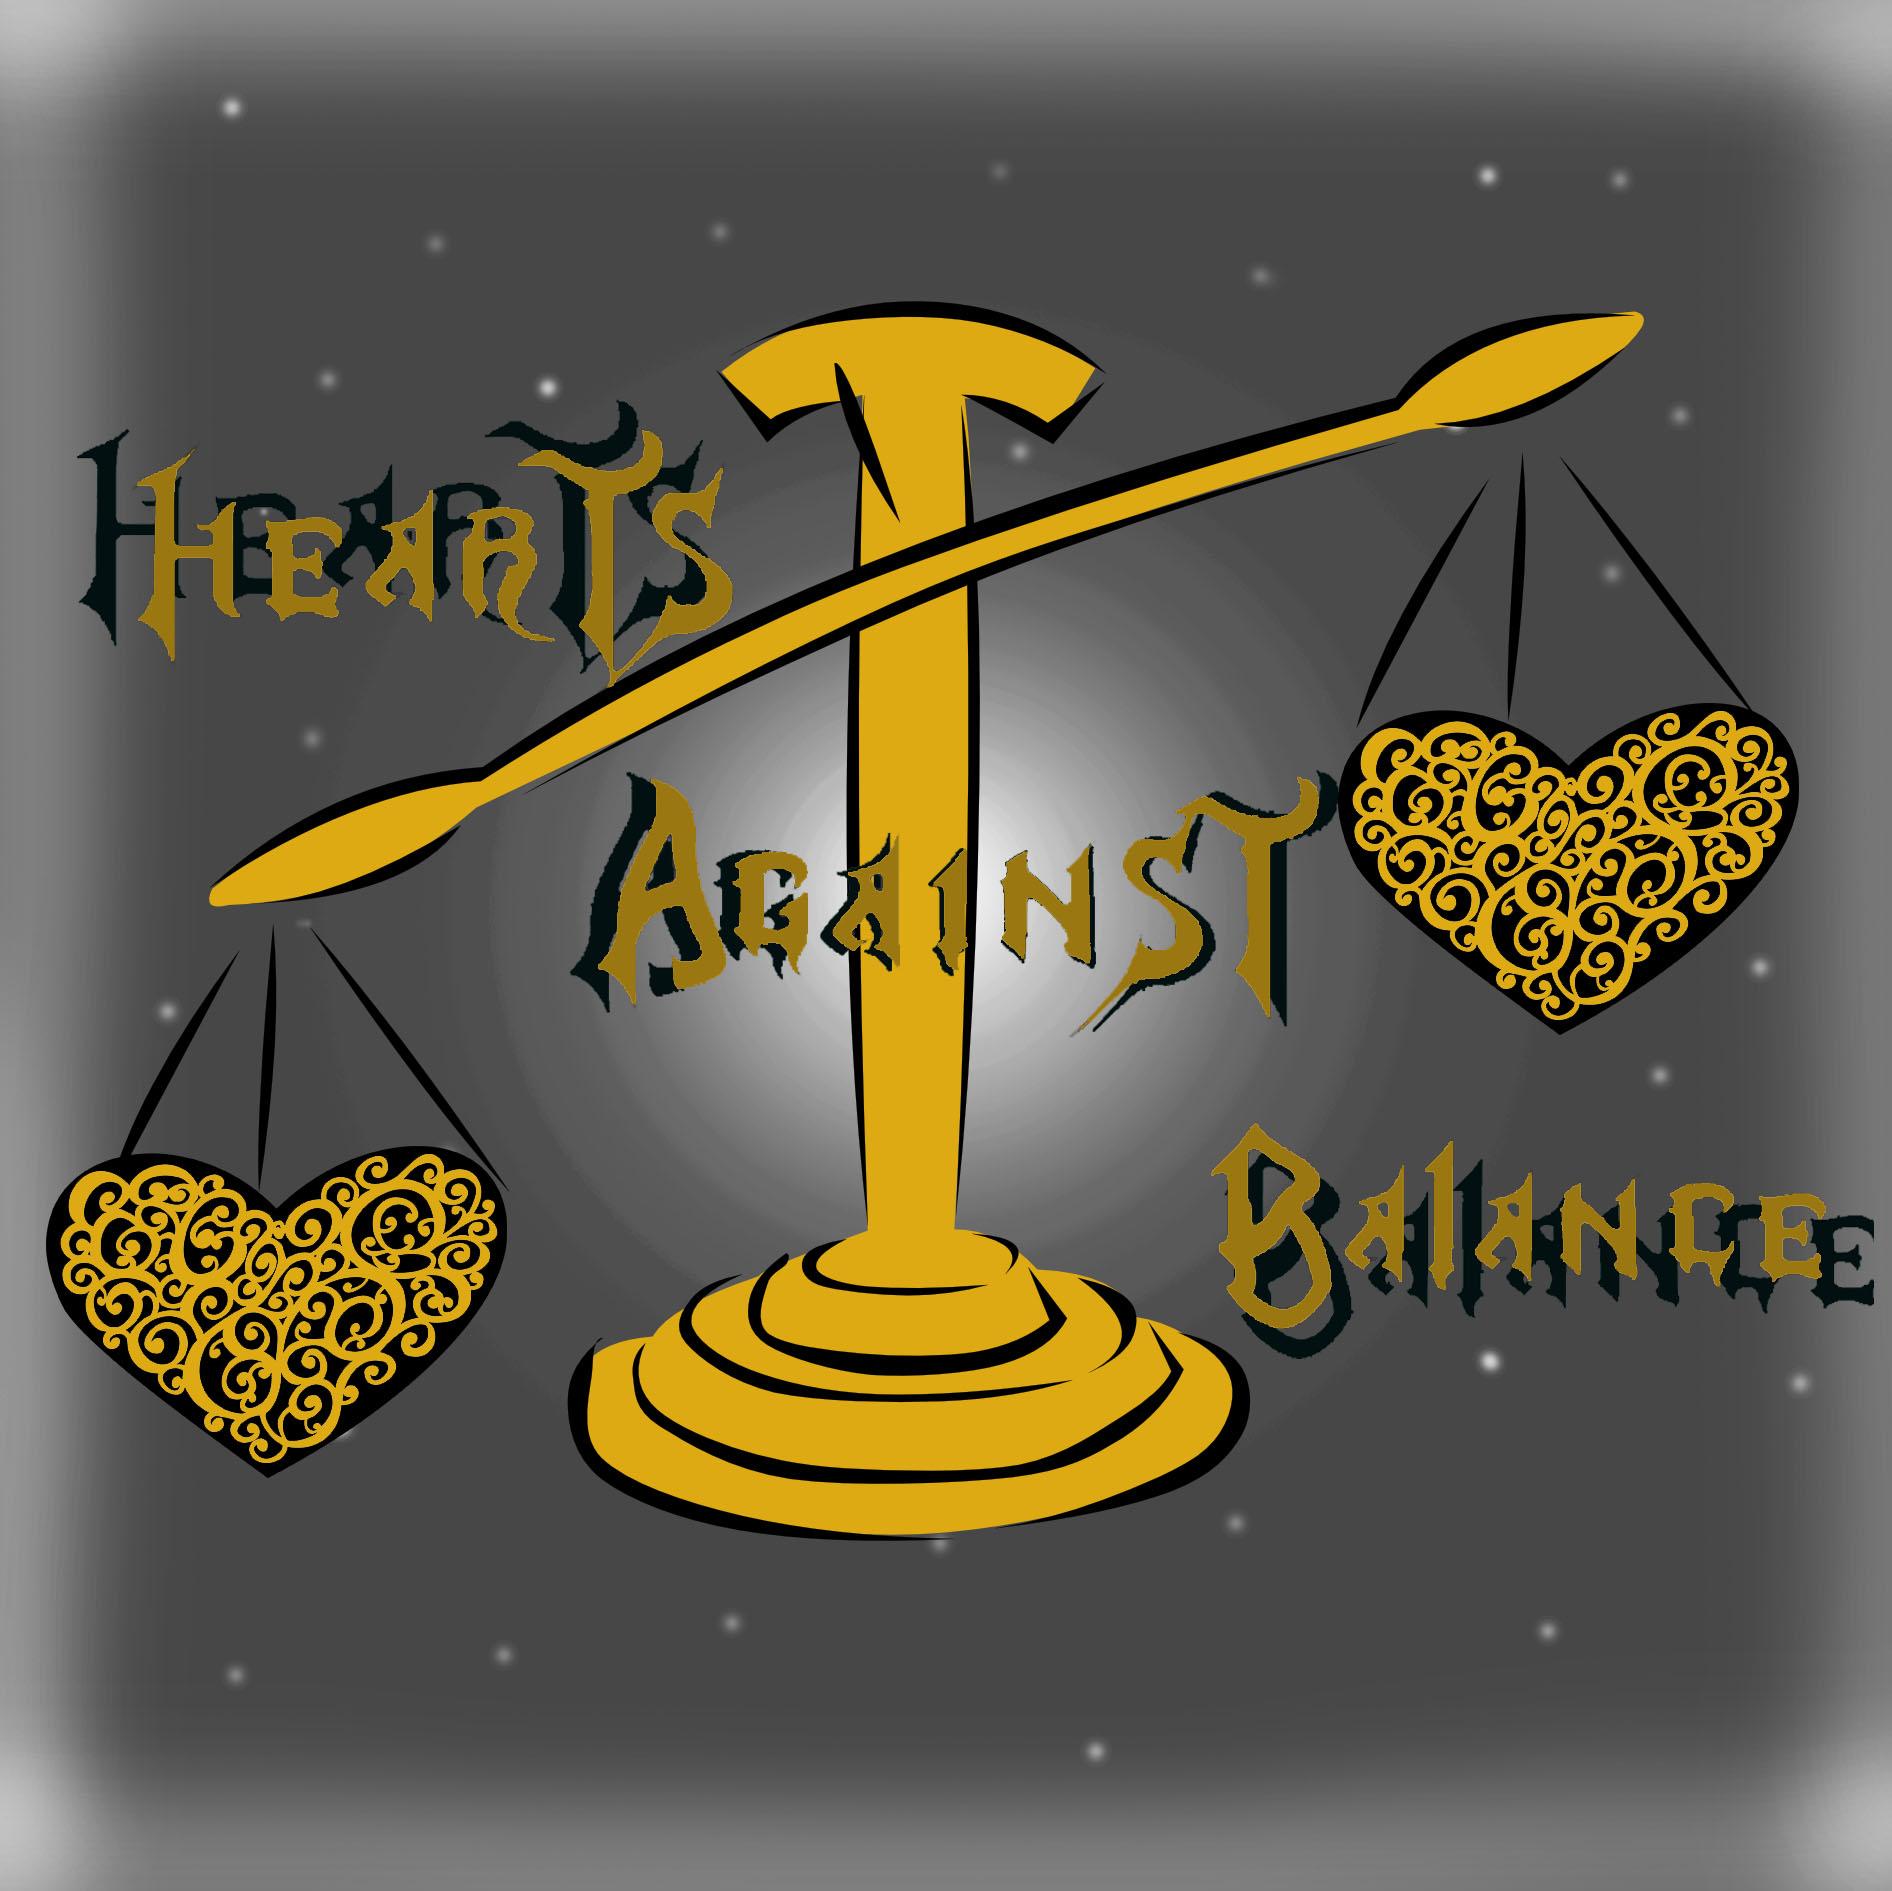 Hearts Against: Balance show art